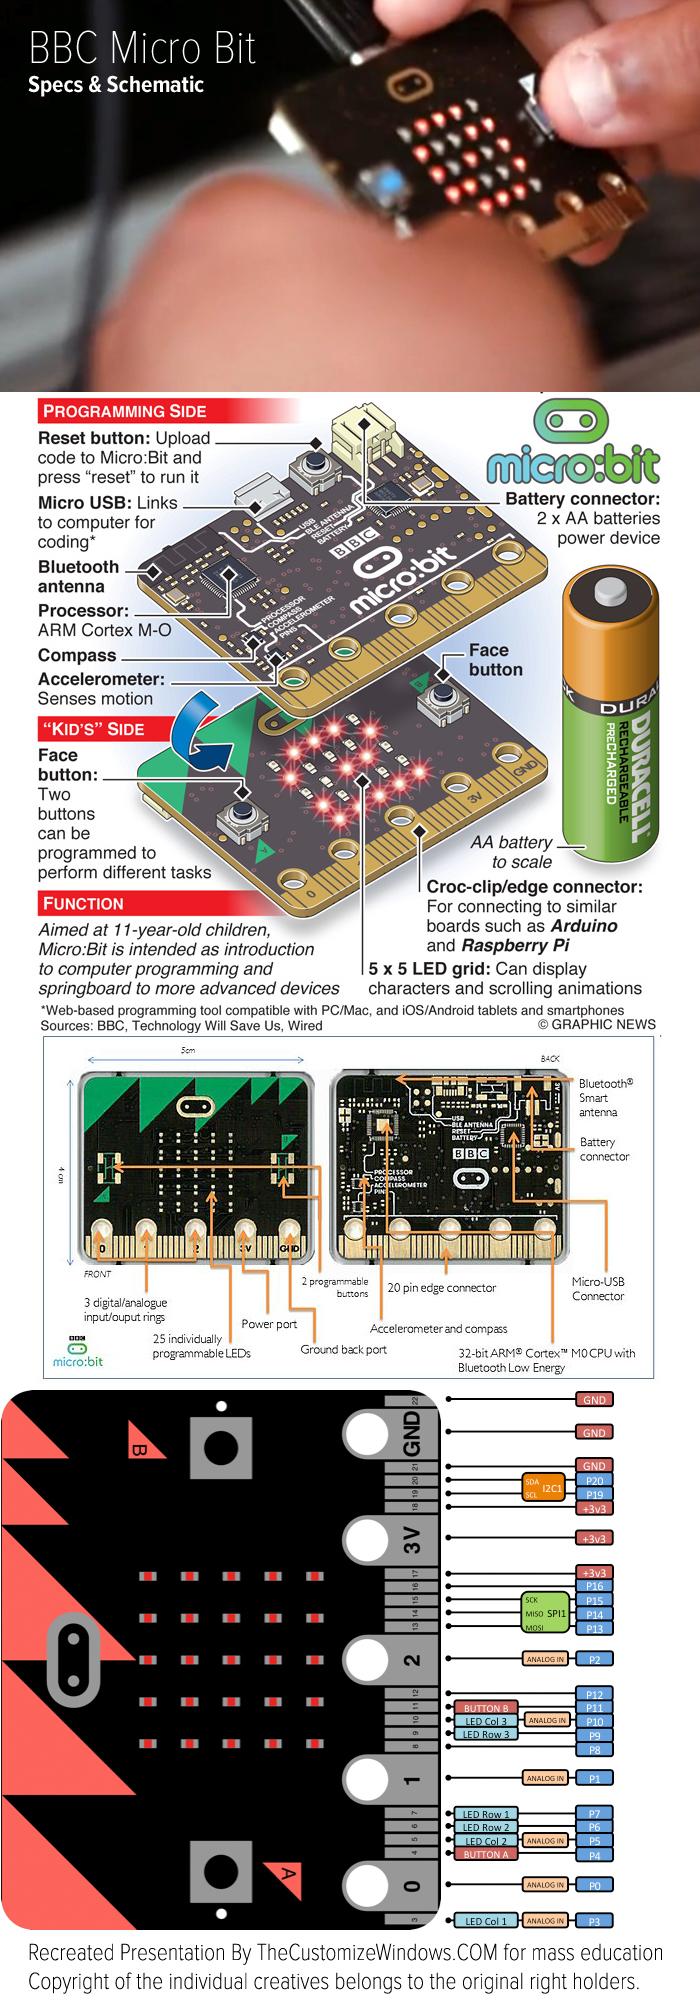 BBC-Micro-Bit-Specs-&-Schematic